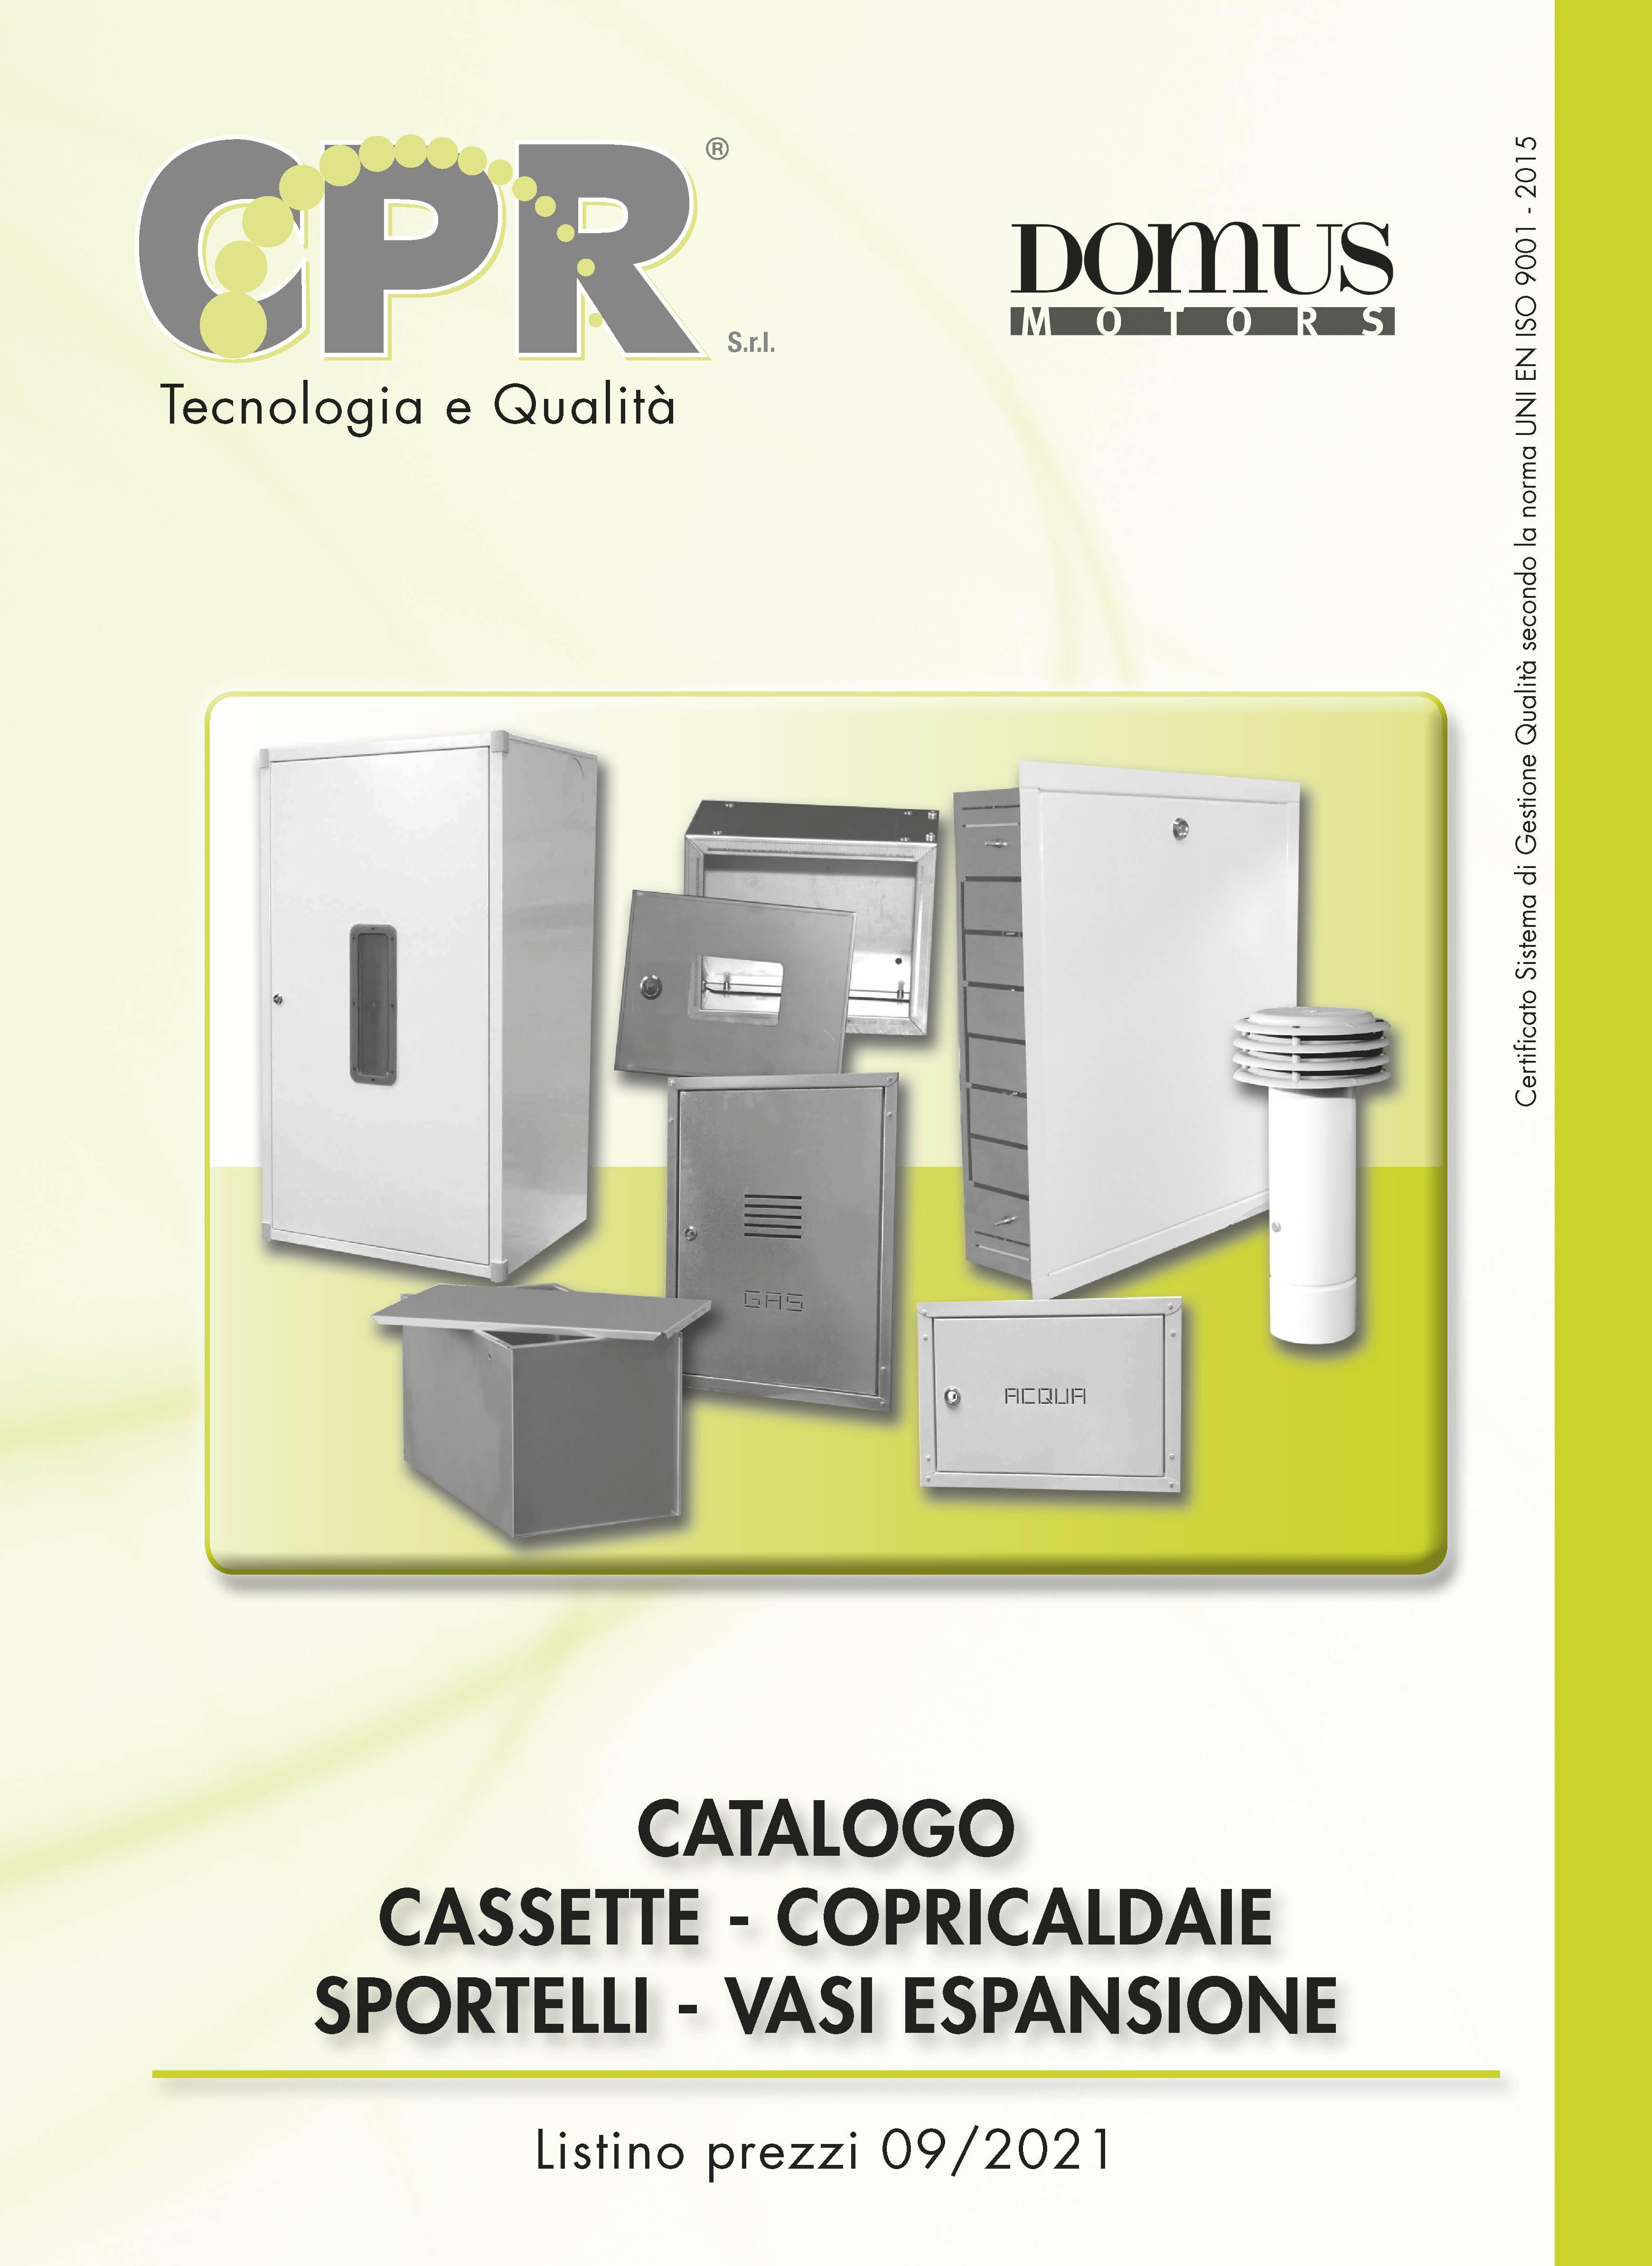 Cassette - copricaldaie - sportelli - vasi espansione 09/2021